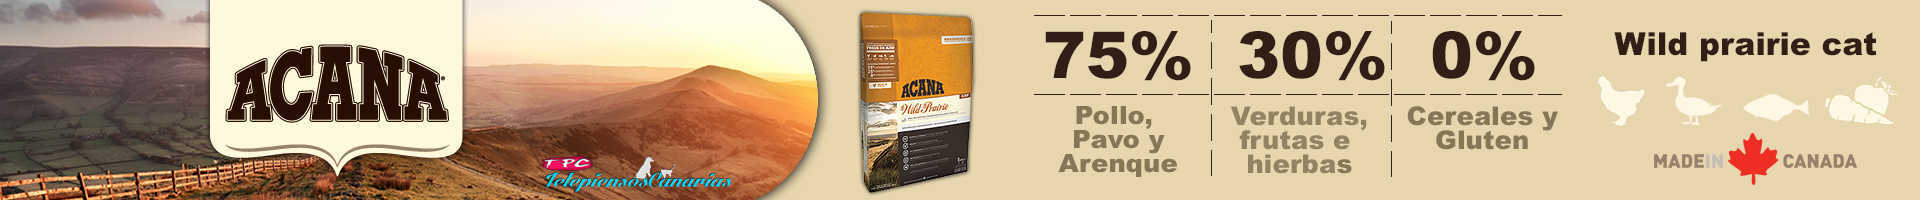 Acana wild prairie cat and kitten, con 70% de carnes 30% verduras y frutas